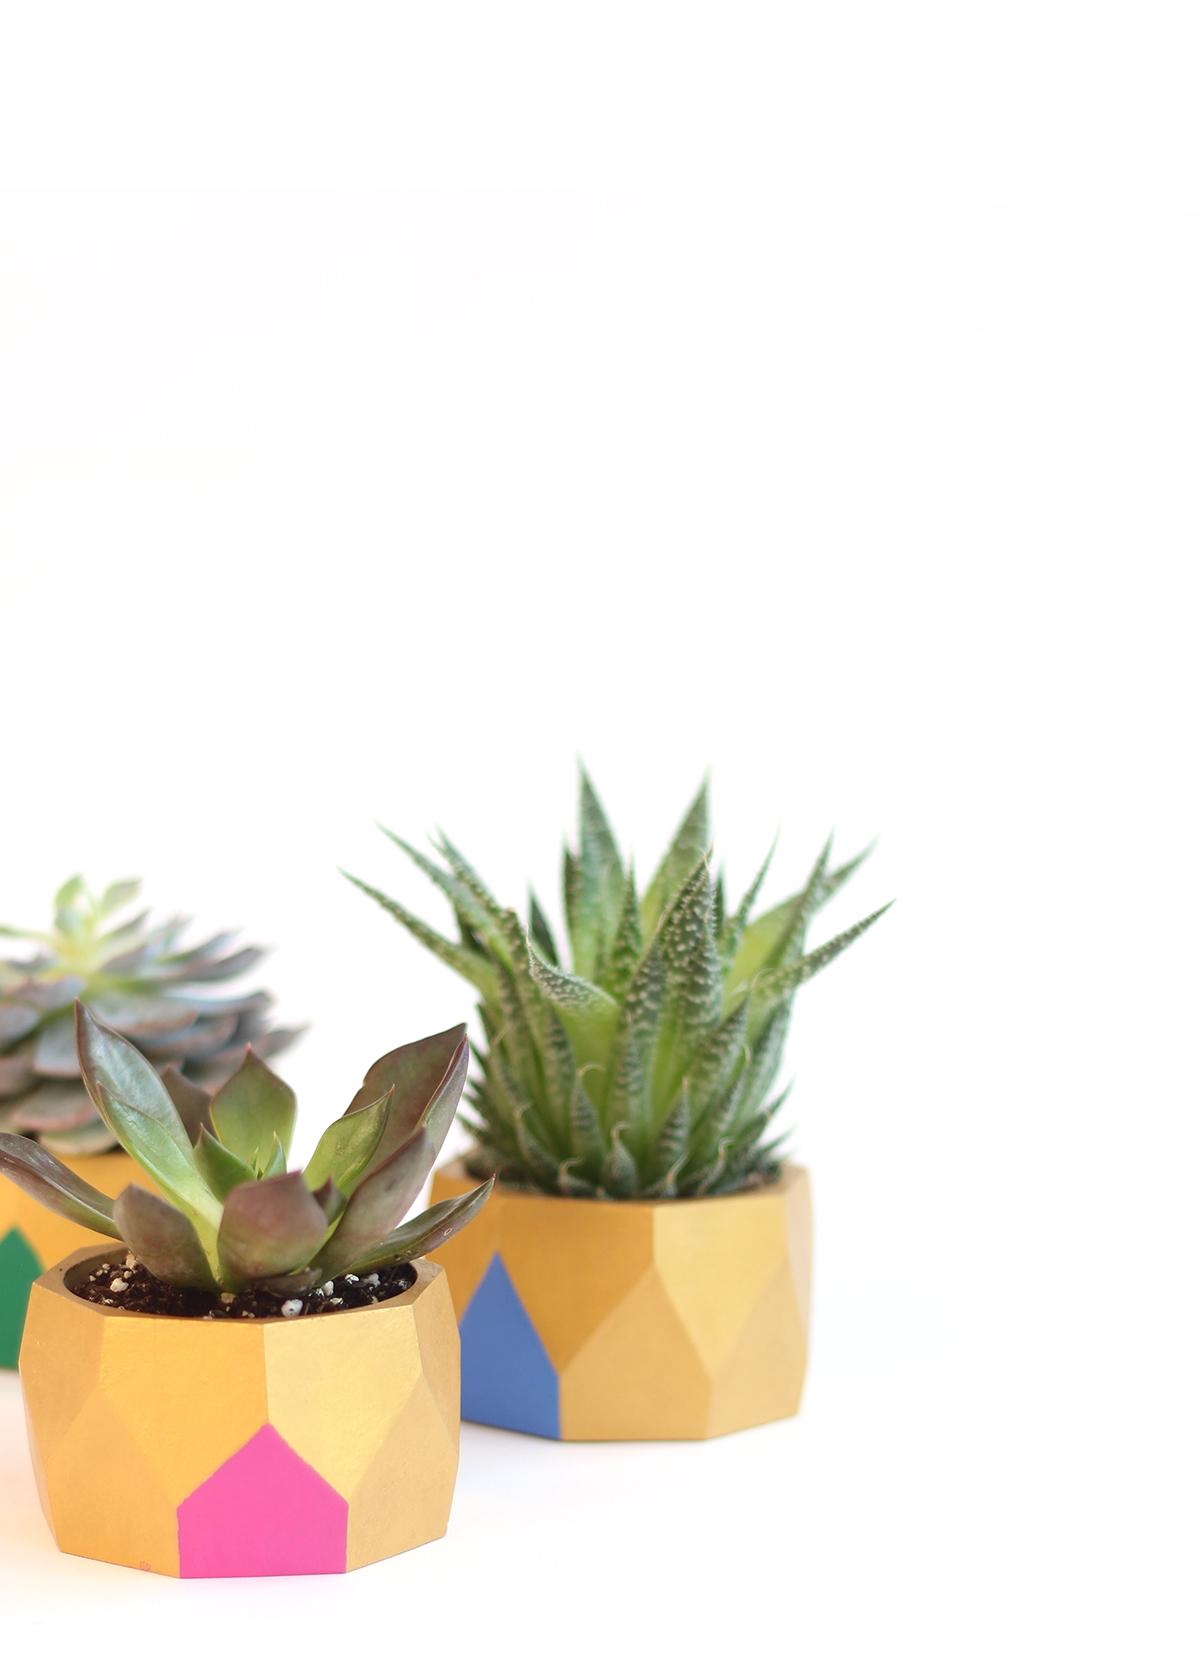 Wooden bracelet planter